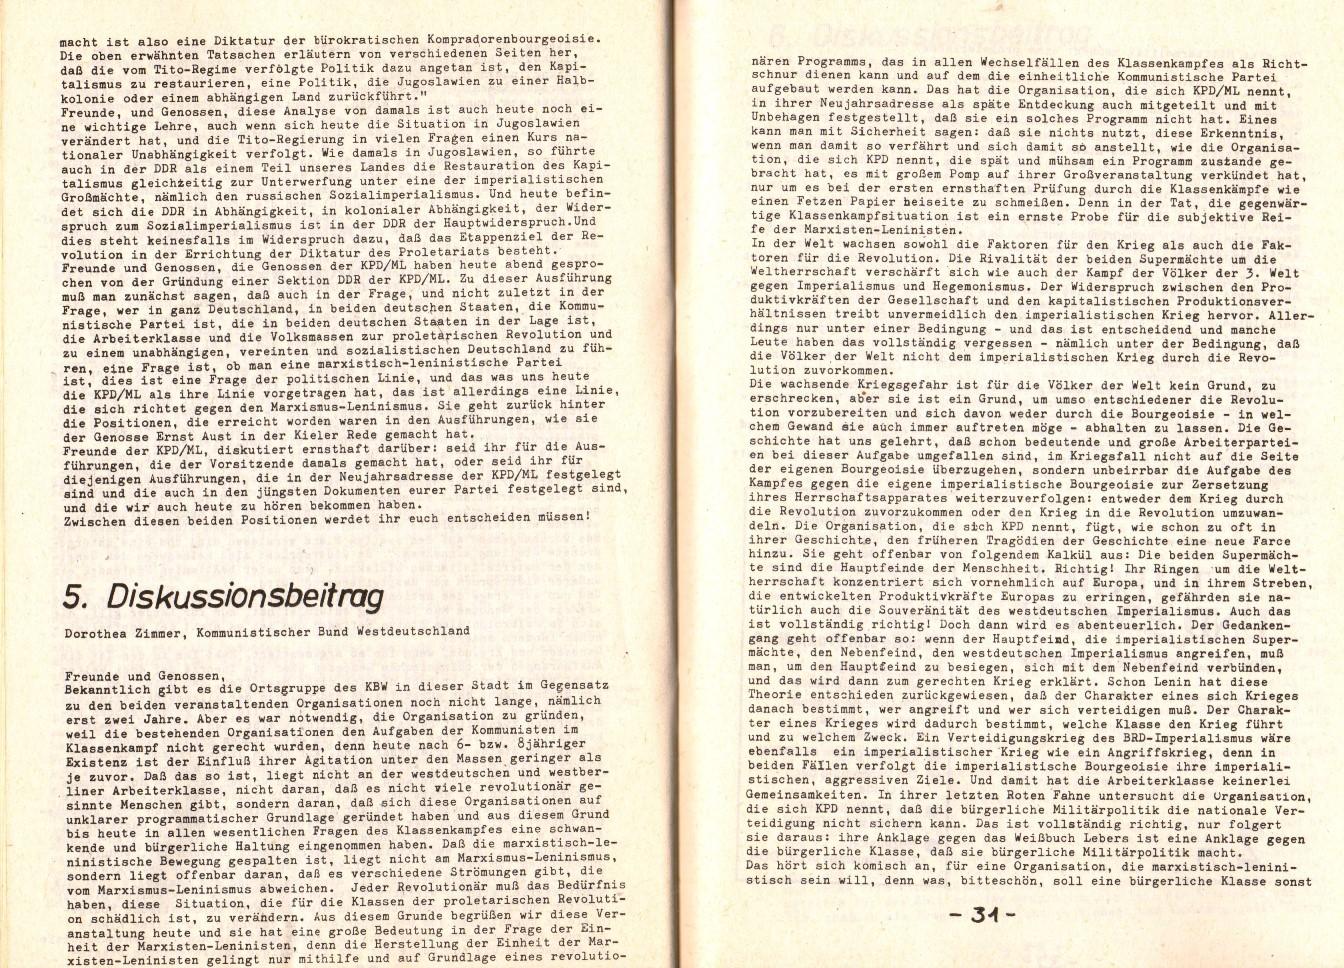 Berlin_AO_1976_Veranstaltung_mit_KPDML_16